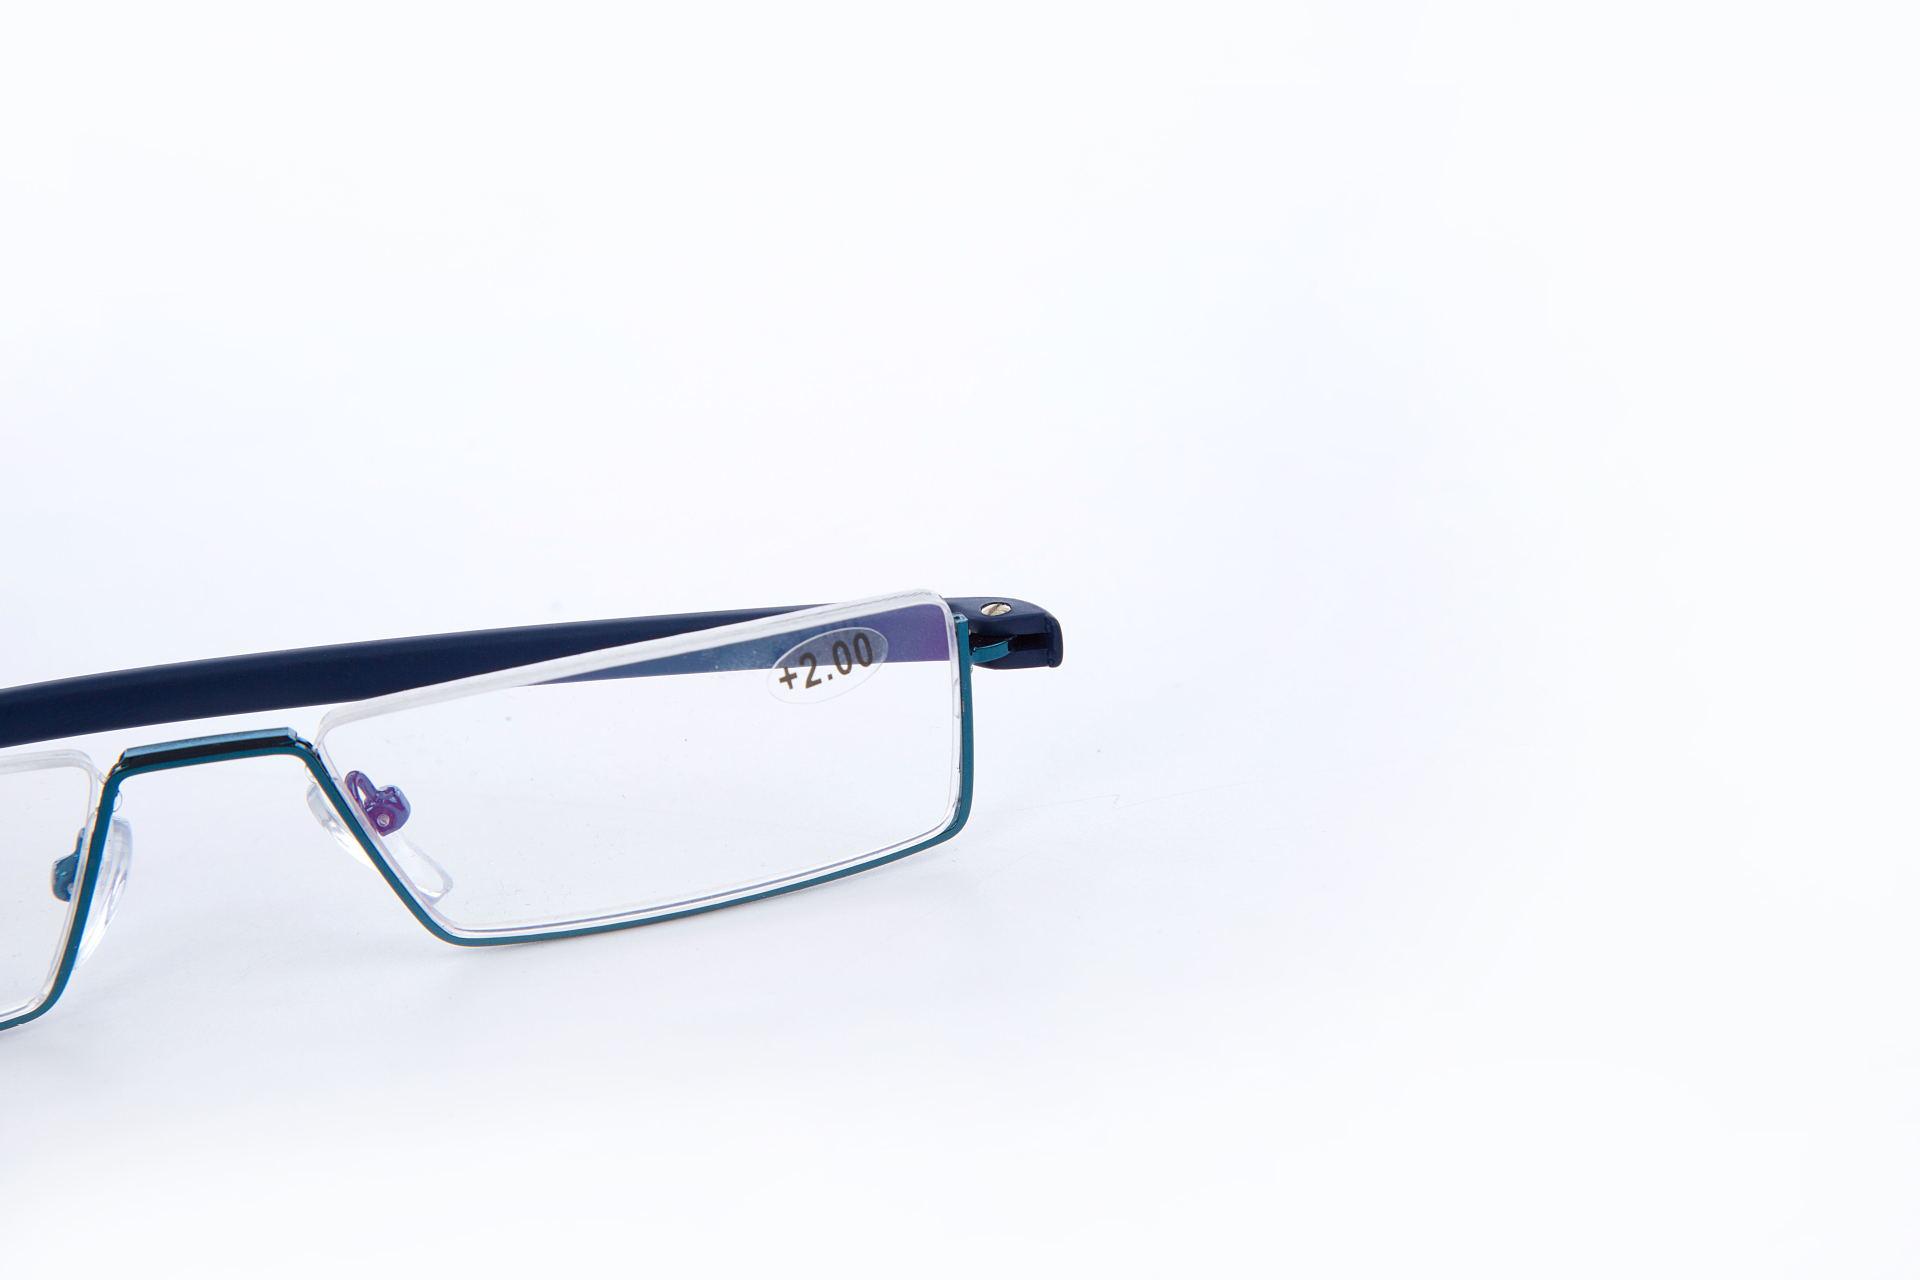 High Quality Box Free Slim Reading Glasses Men Women Point For Men's Women's For Read Titianium Tr90 1.0 2.0 1.5 2.5 3.0 3.5 4.0